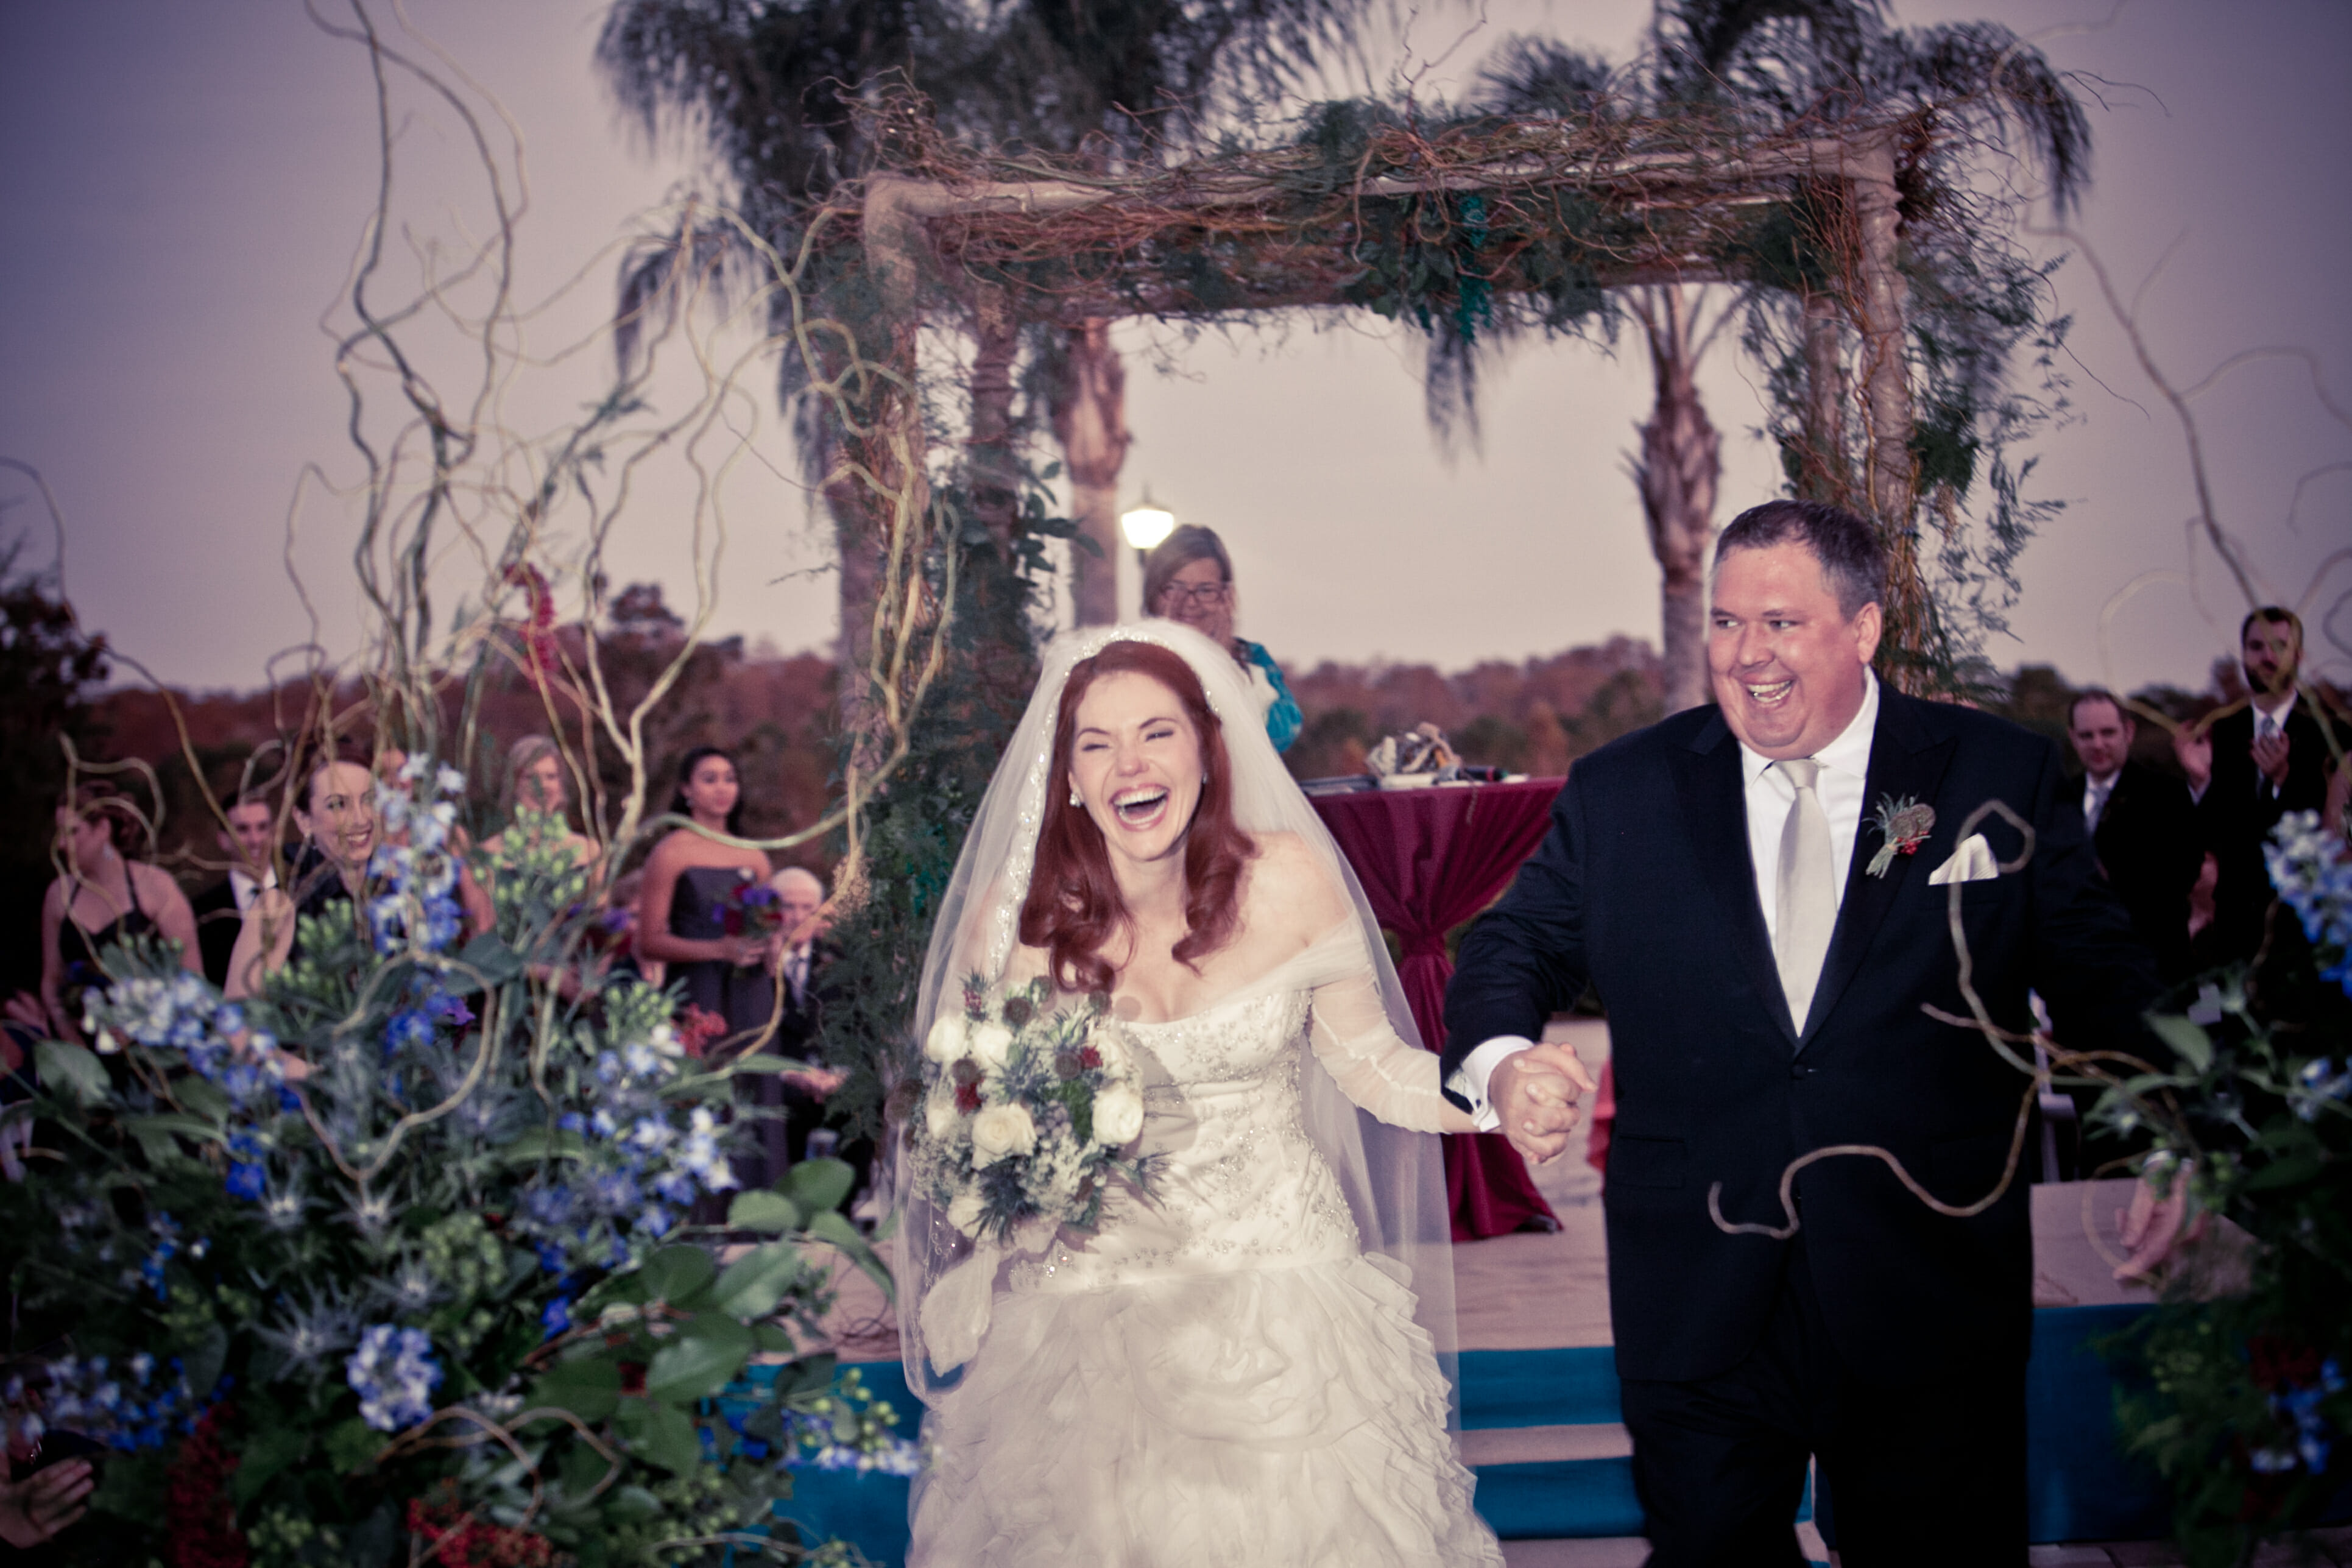 Orlando_Wedding_Planner_RW Events (81)